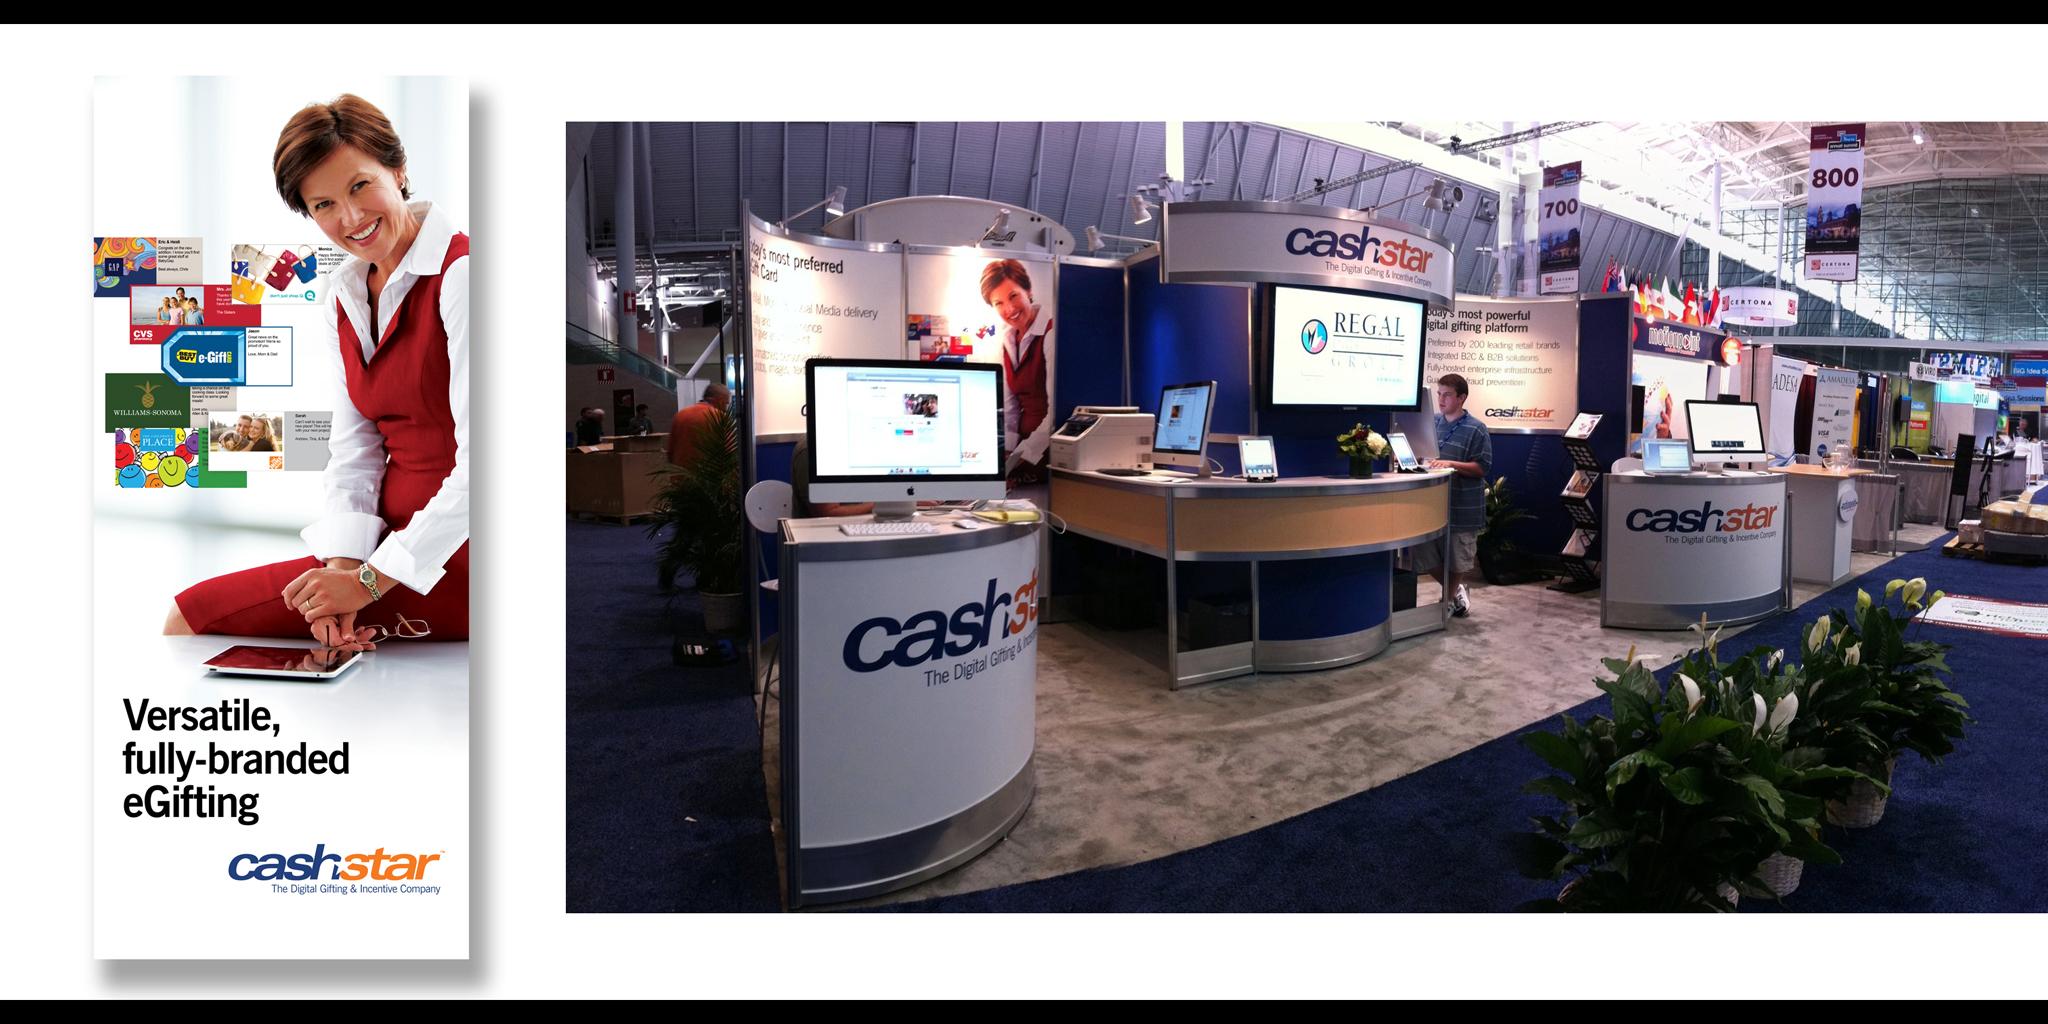 CashStar_Booth_2_1024.jpg